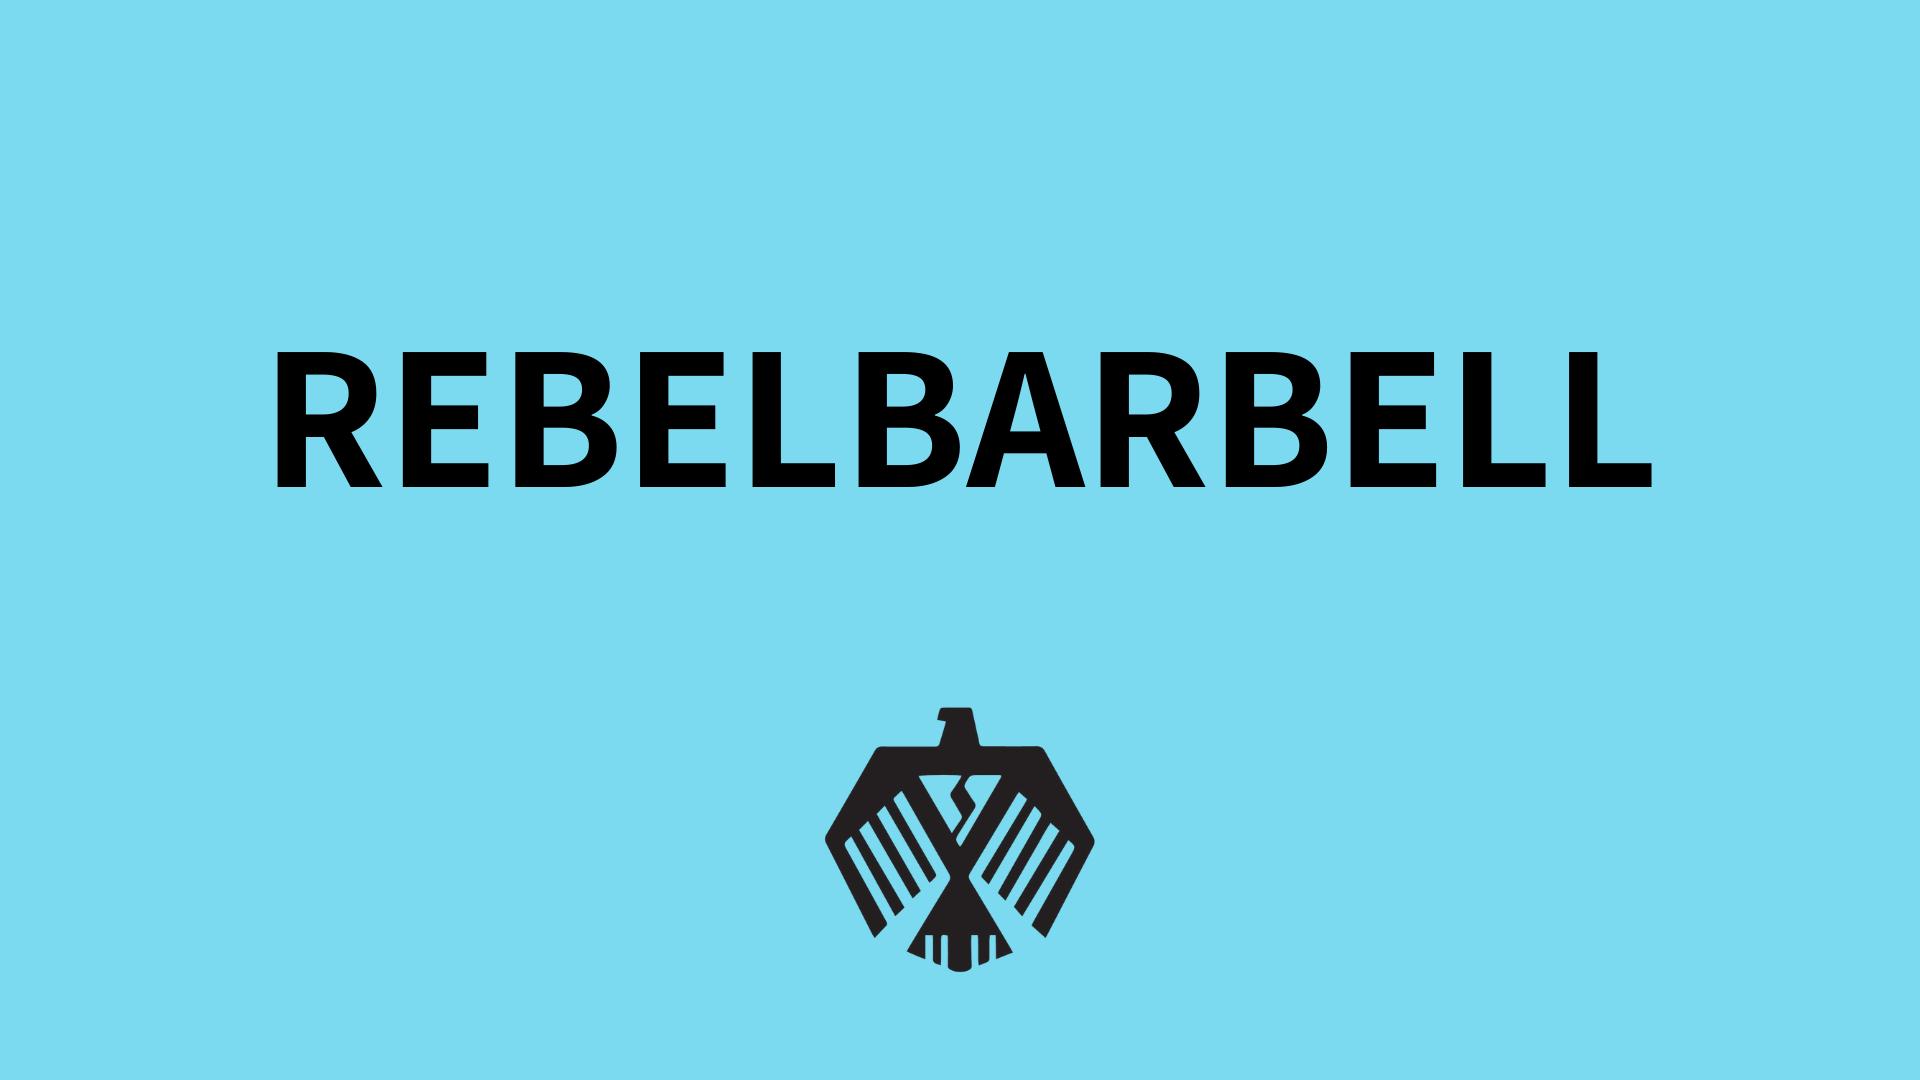 REBELBARBELL